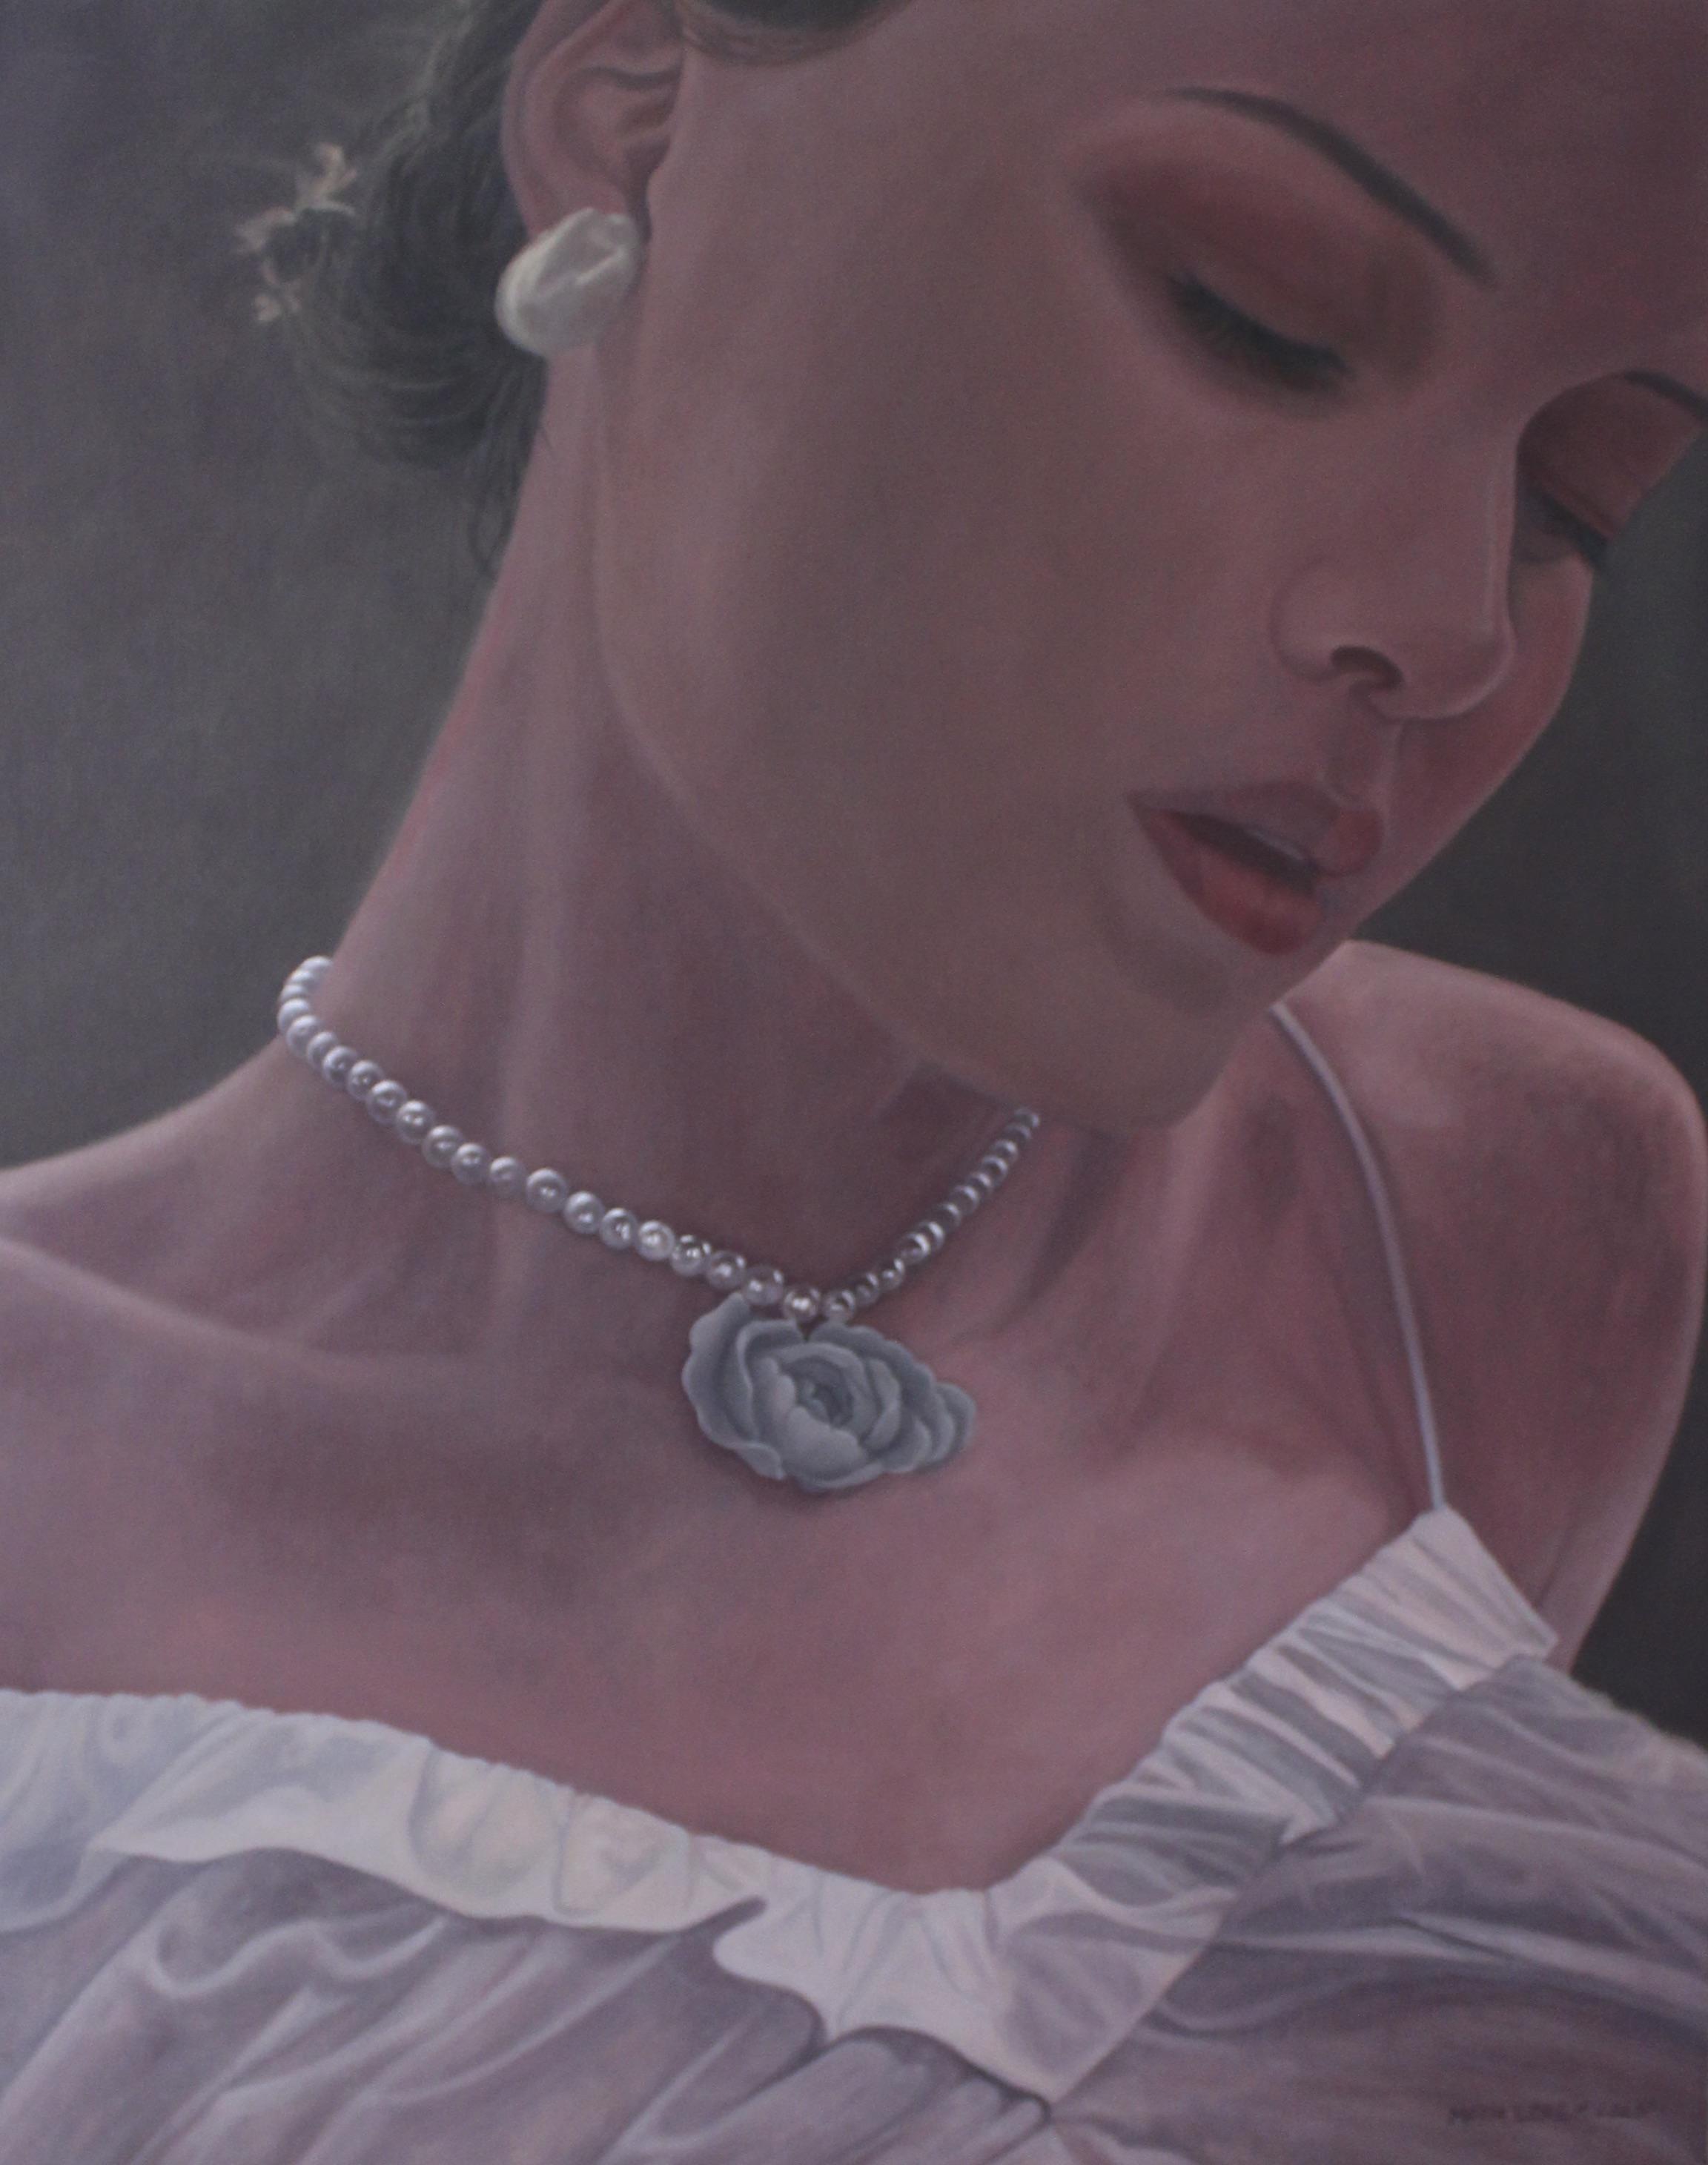 Ragazza con collana di perle ( Dziewczyna z perłami), 2020